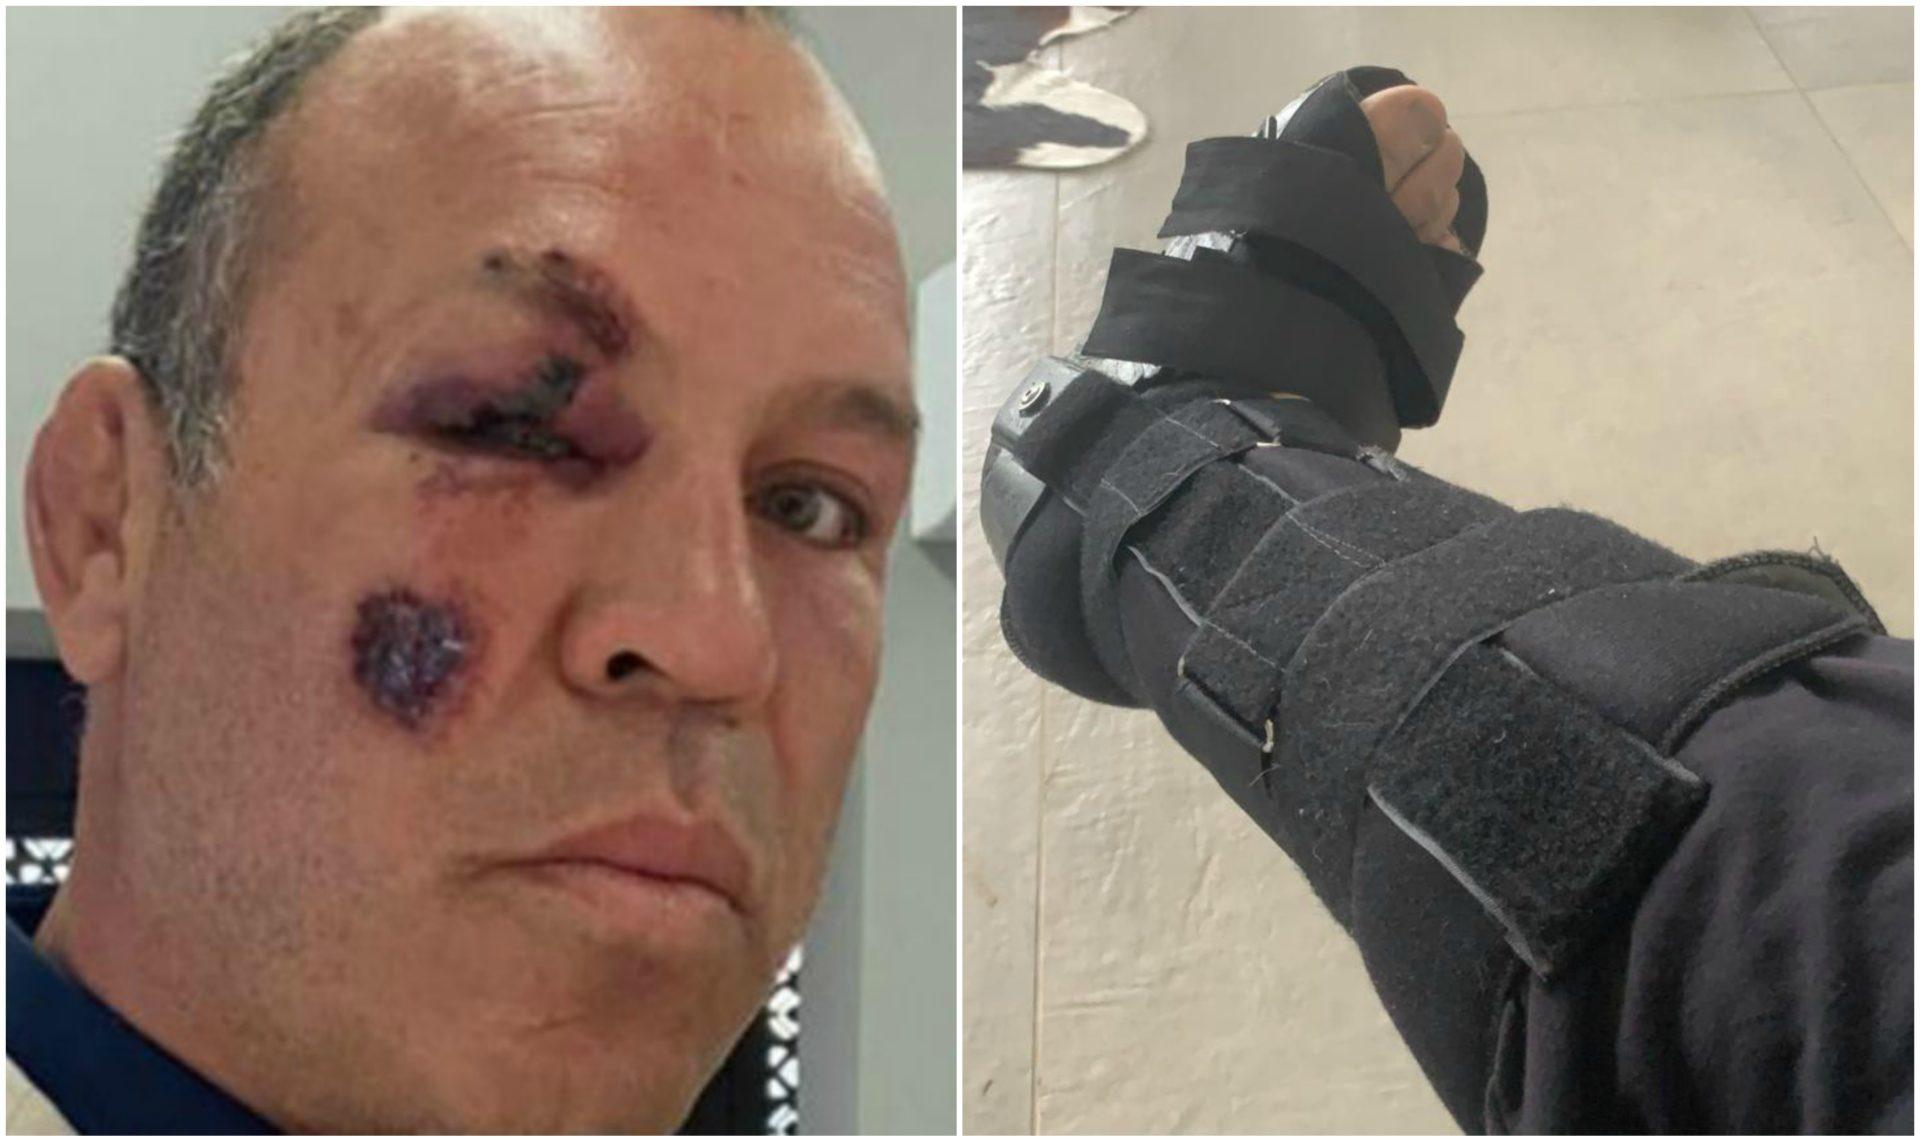 UFC veteran Wanderlei Silva survives bicycle accident after being hit by a car - Wanderlei Silva